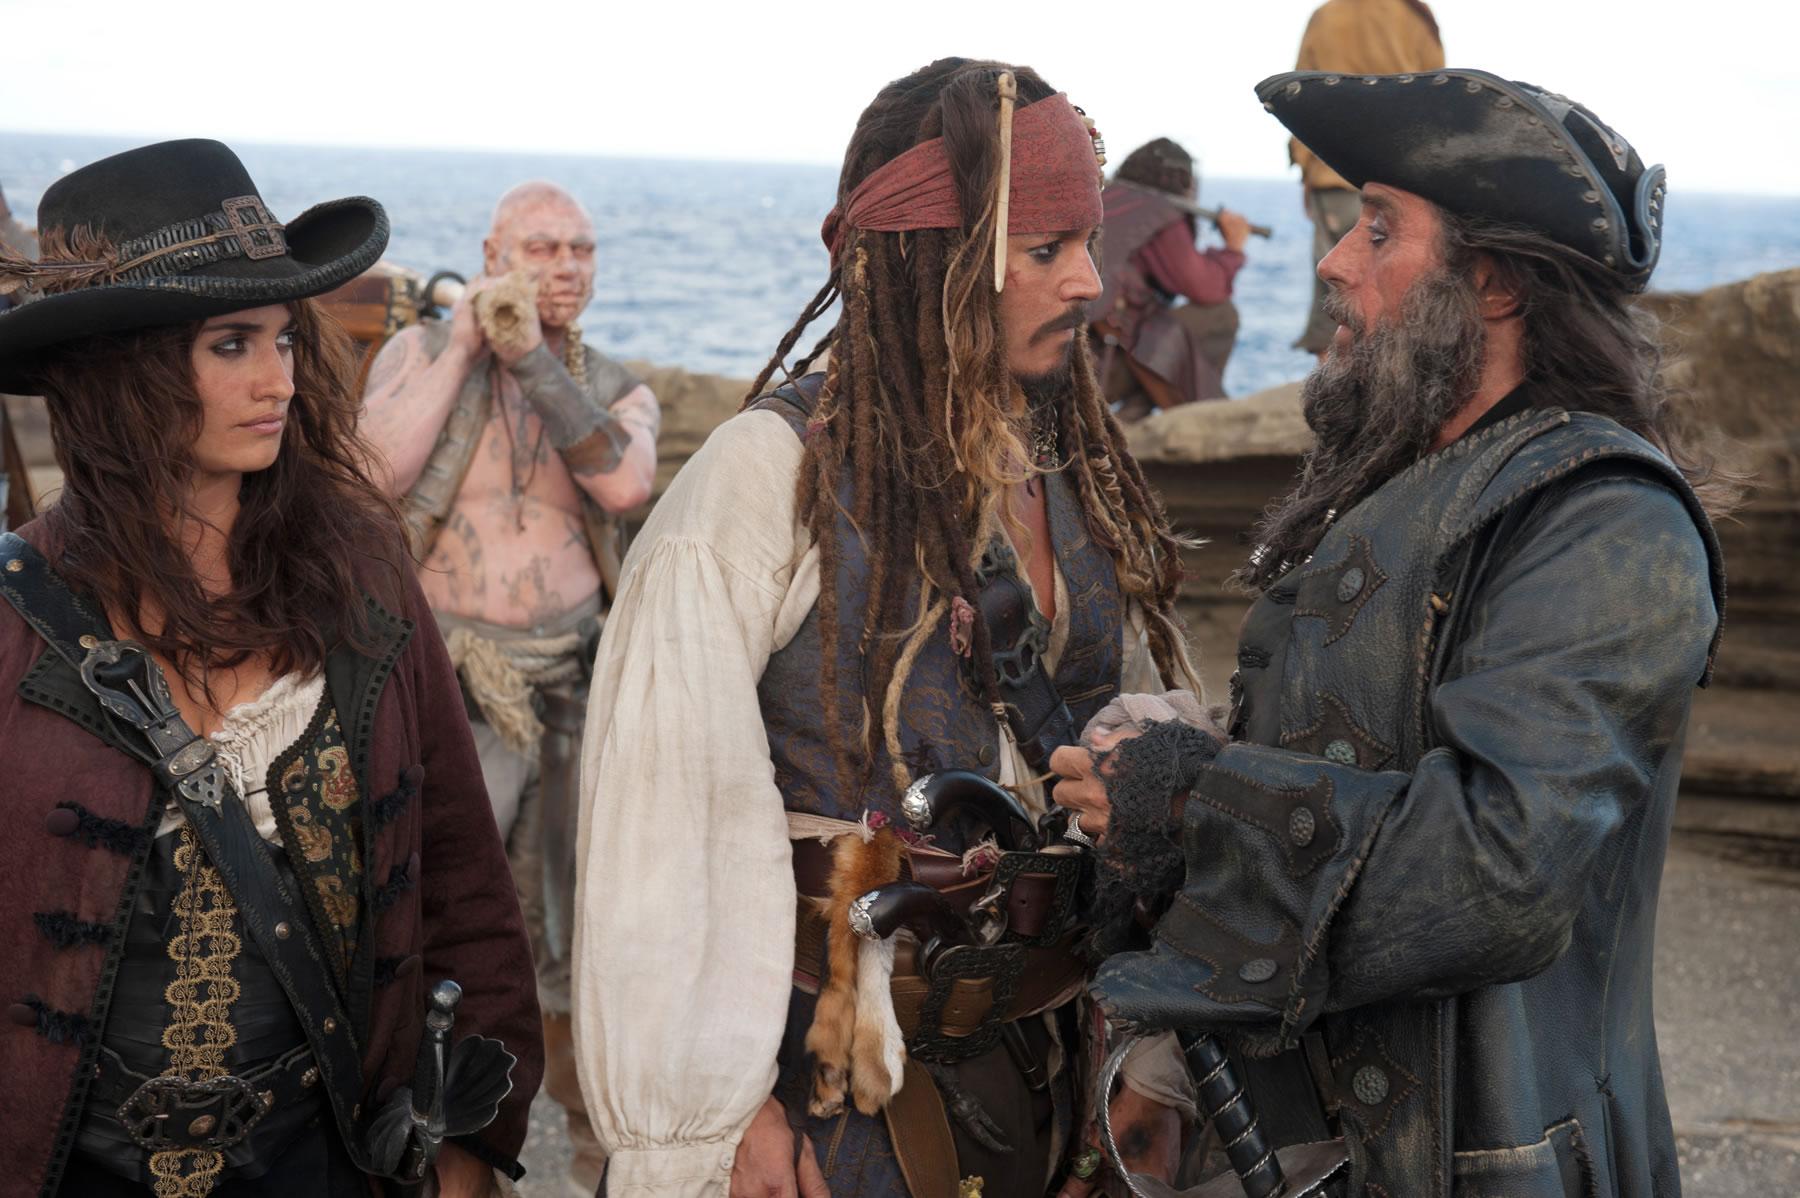 Pirates of the Caribbean: On Stranger Tides TRAILER!